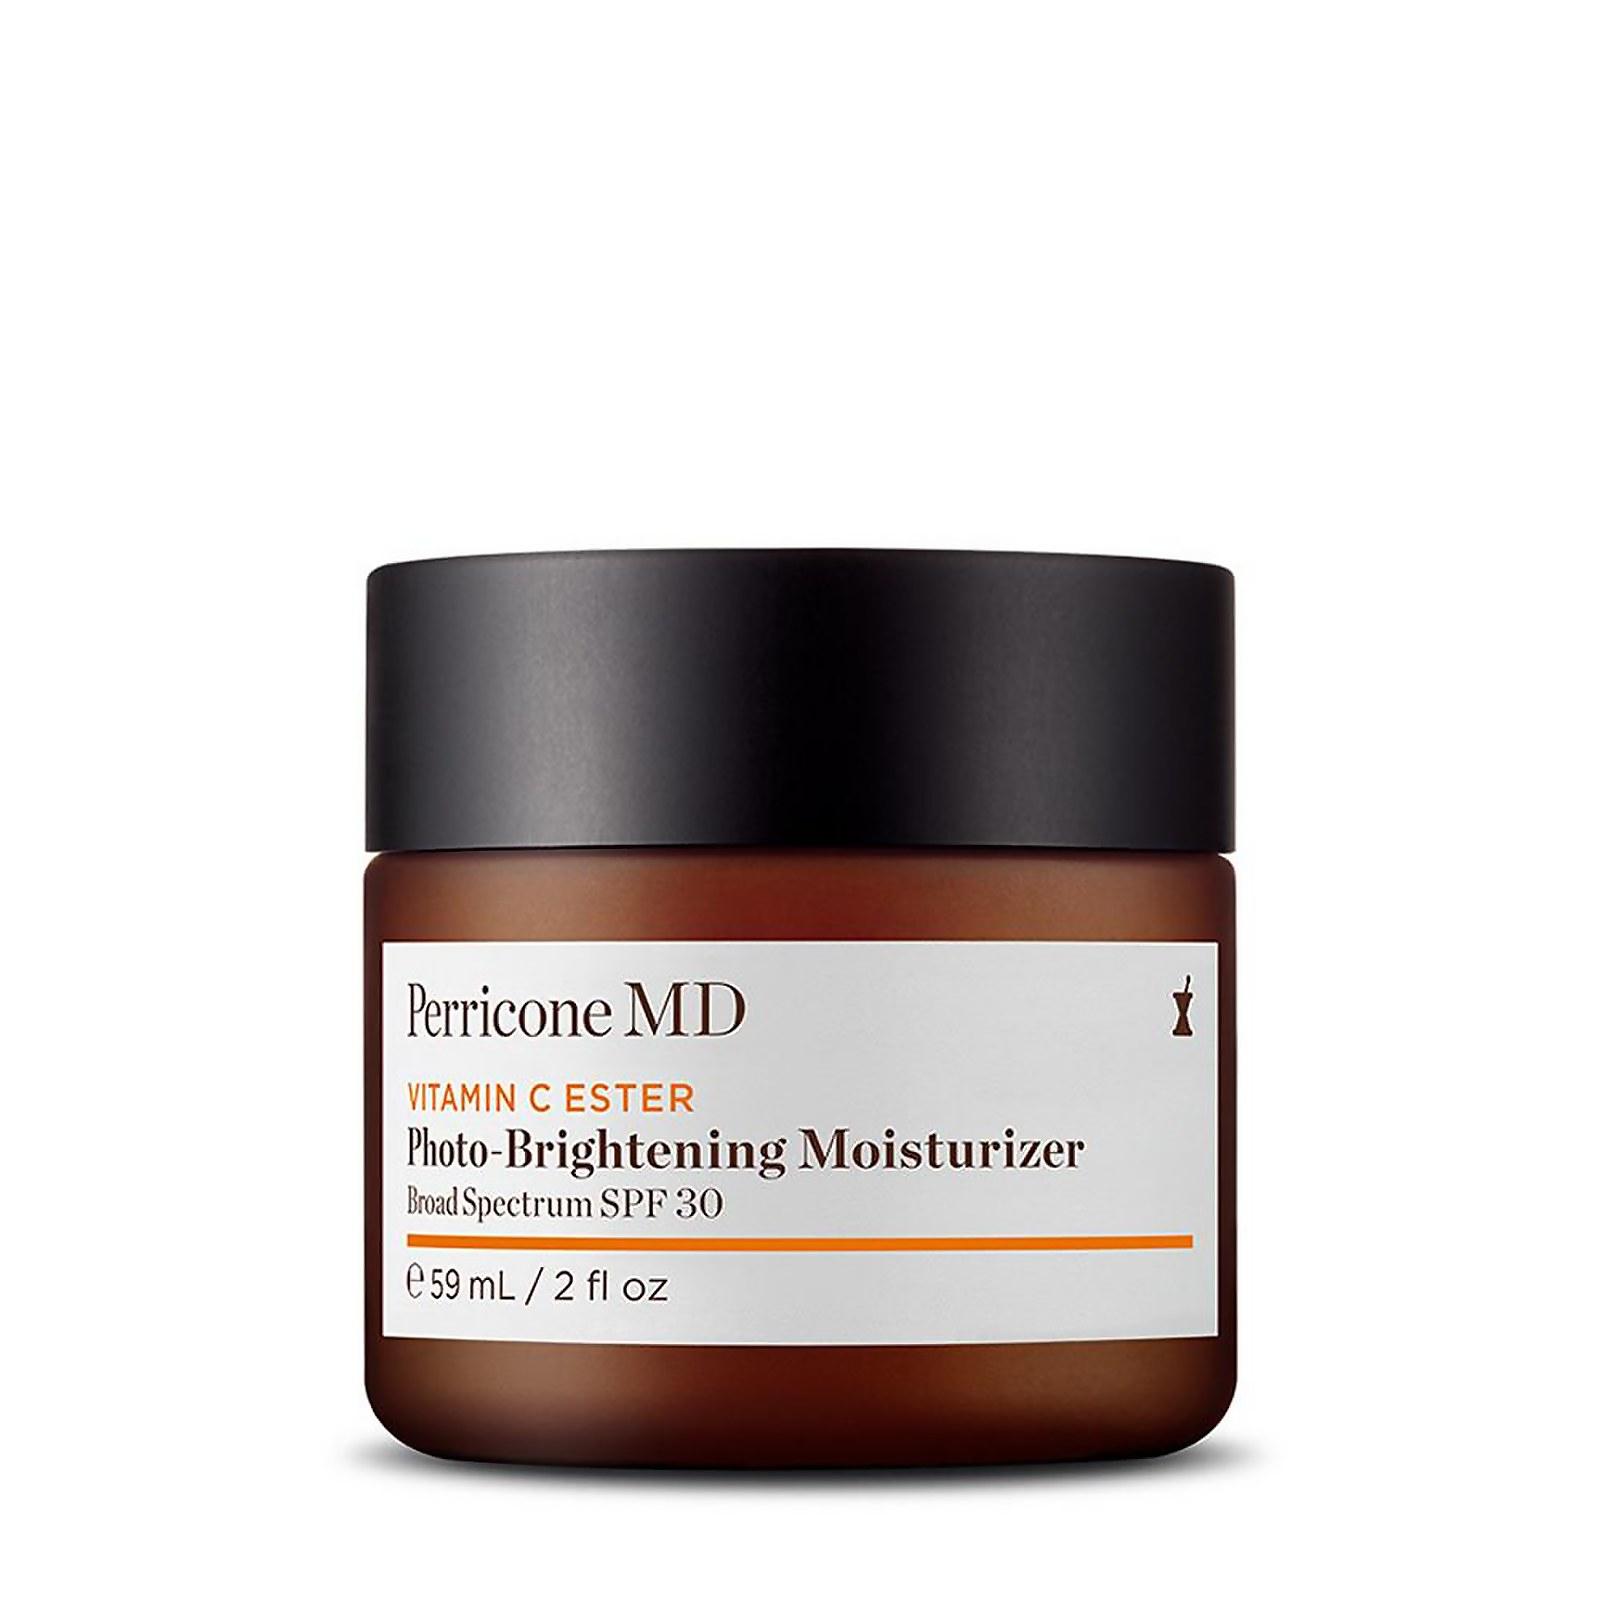 Купить Perricone MD Vitamin C Ester Photo-Brightening Moisturizer - 2 fl.oz / 59ml